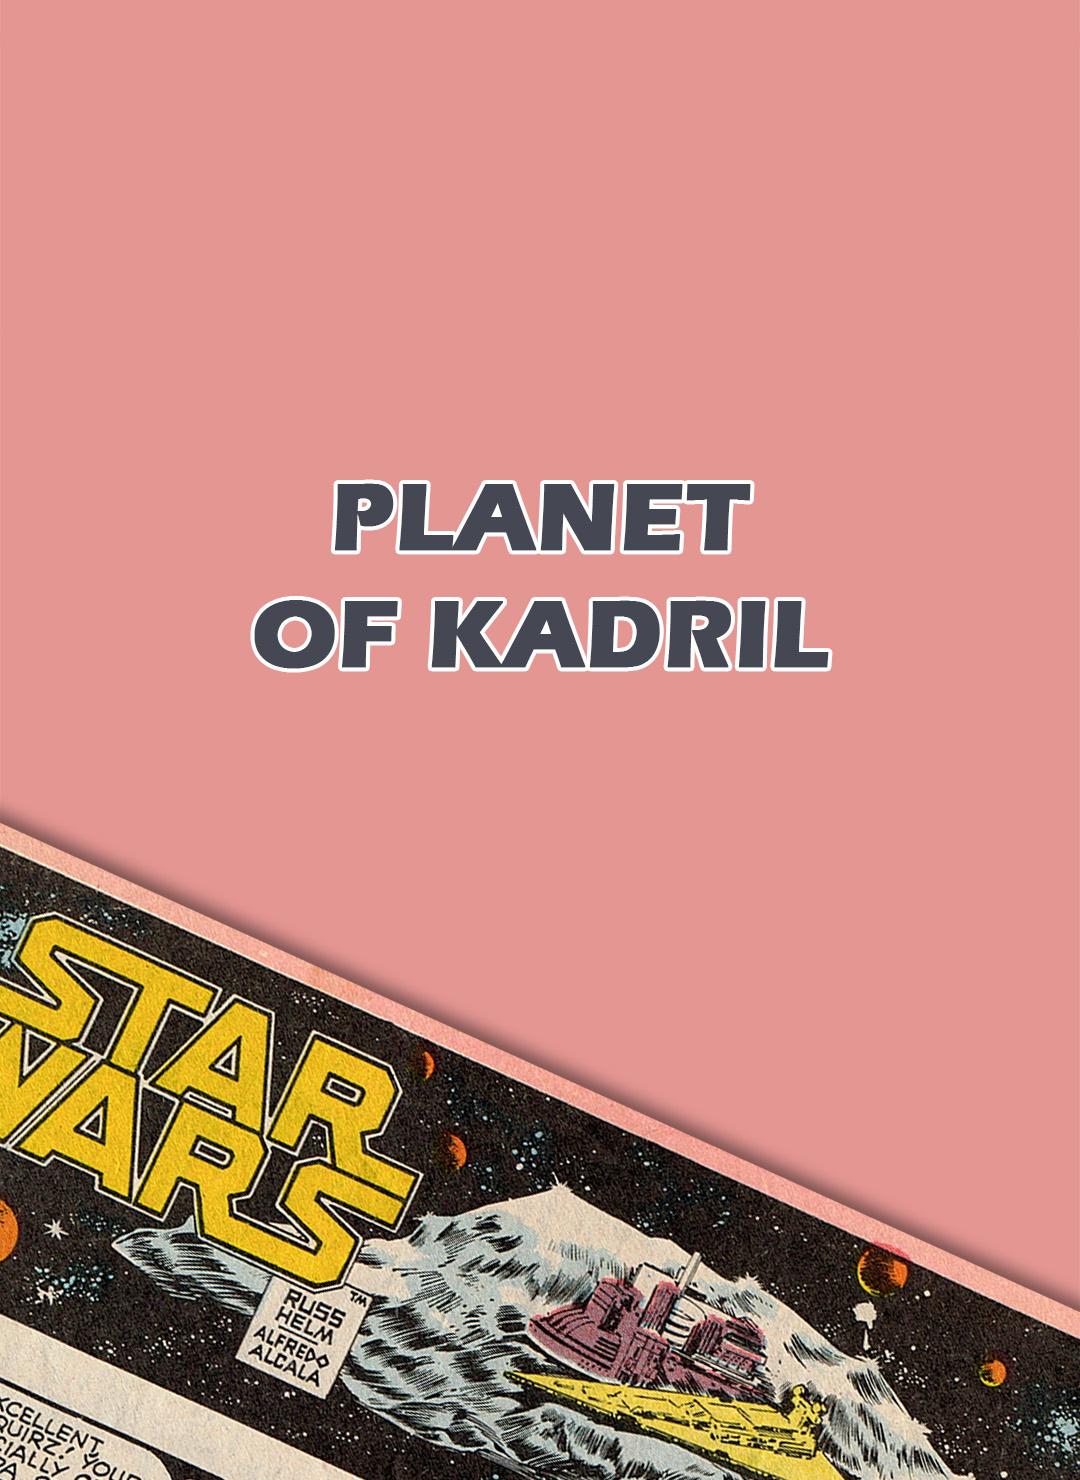 Planet of Kadril